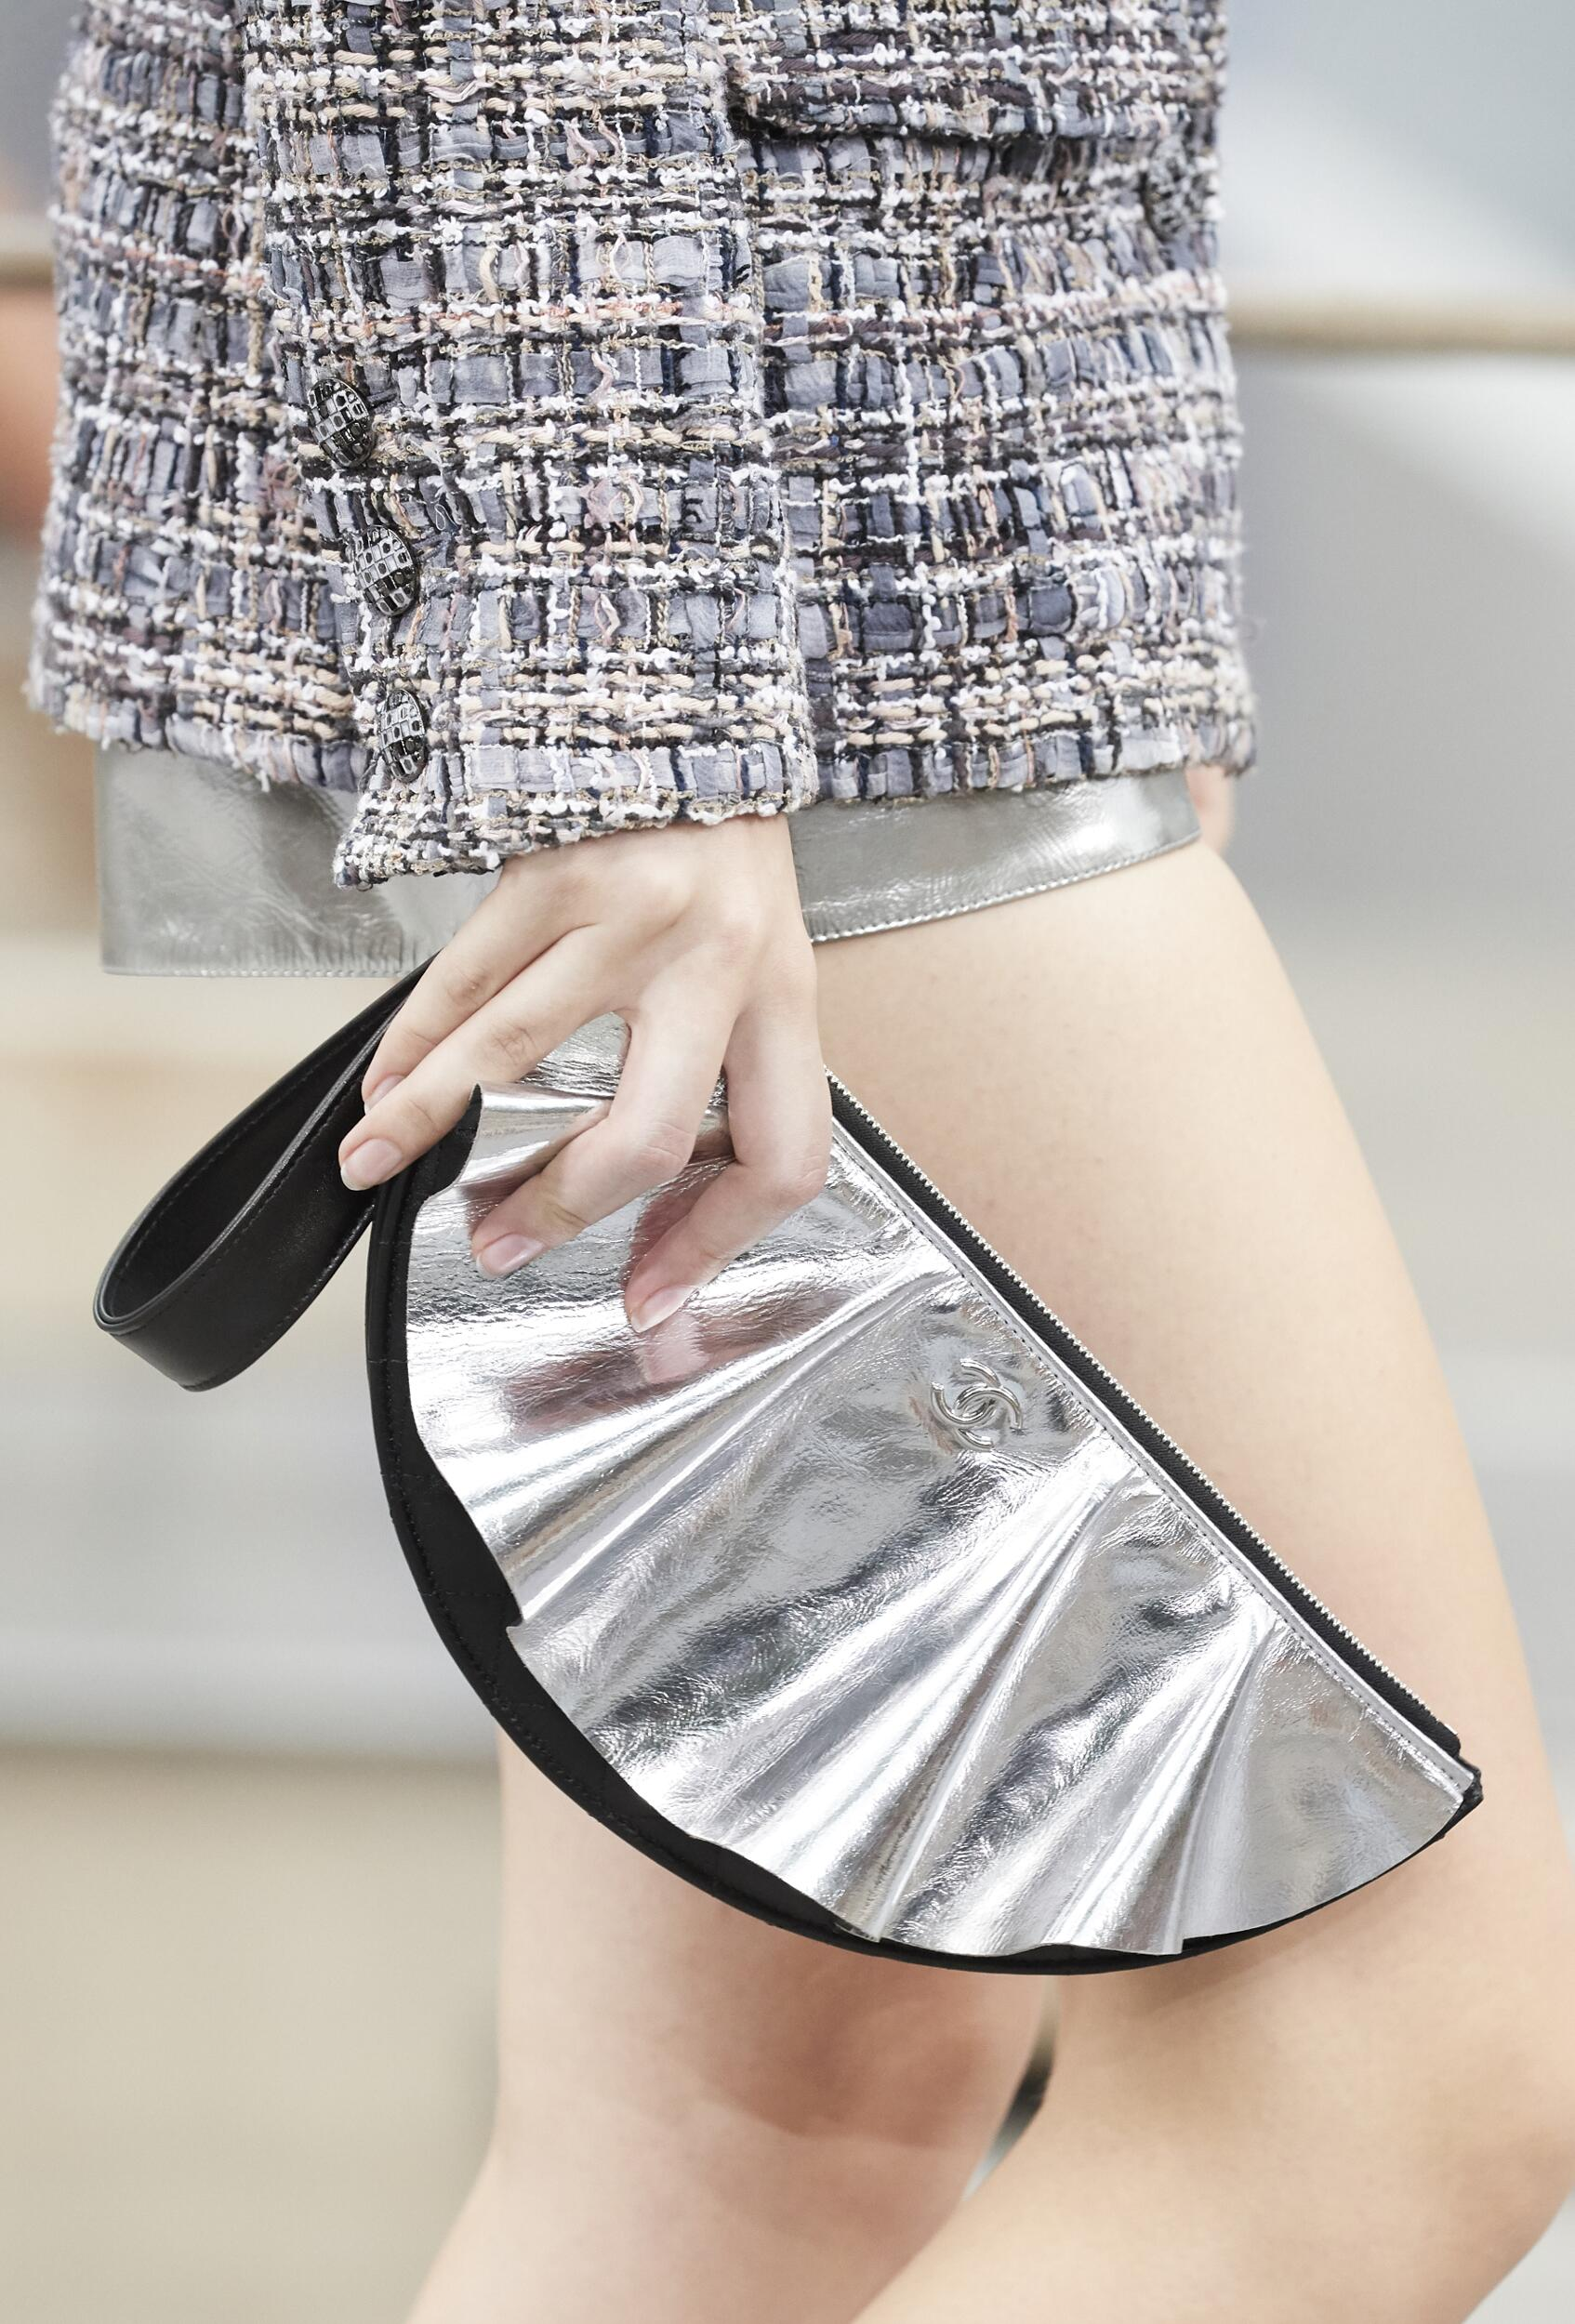 2020 Chanel Summer Bag